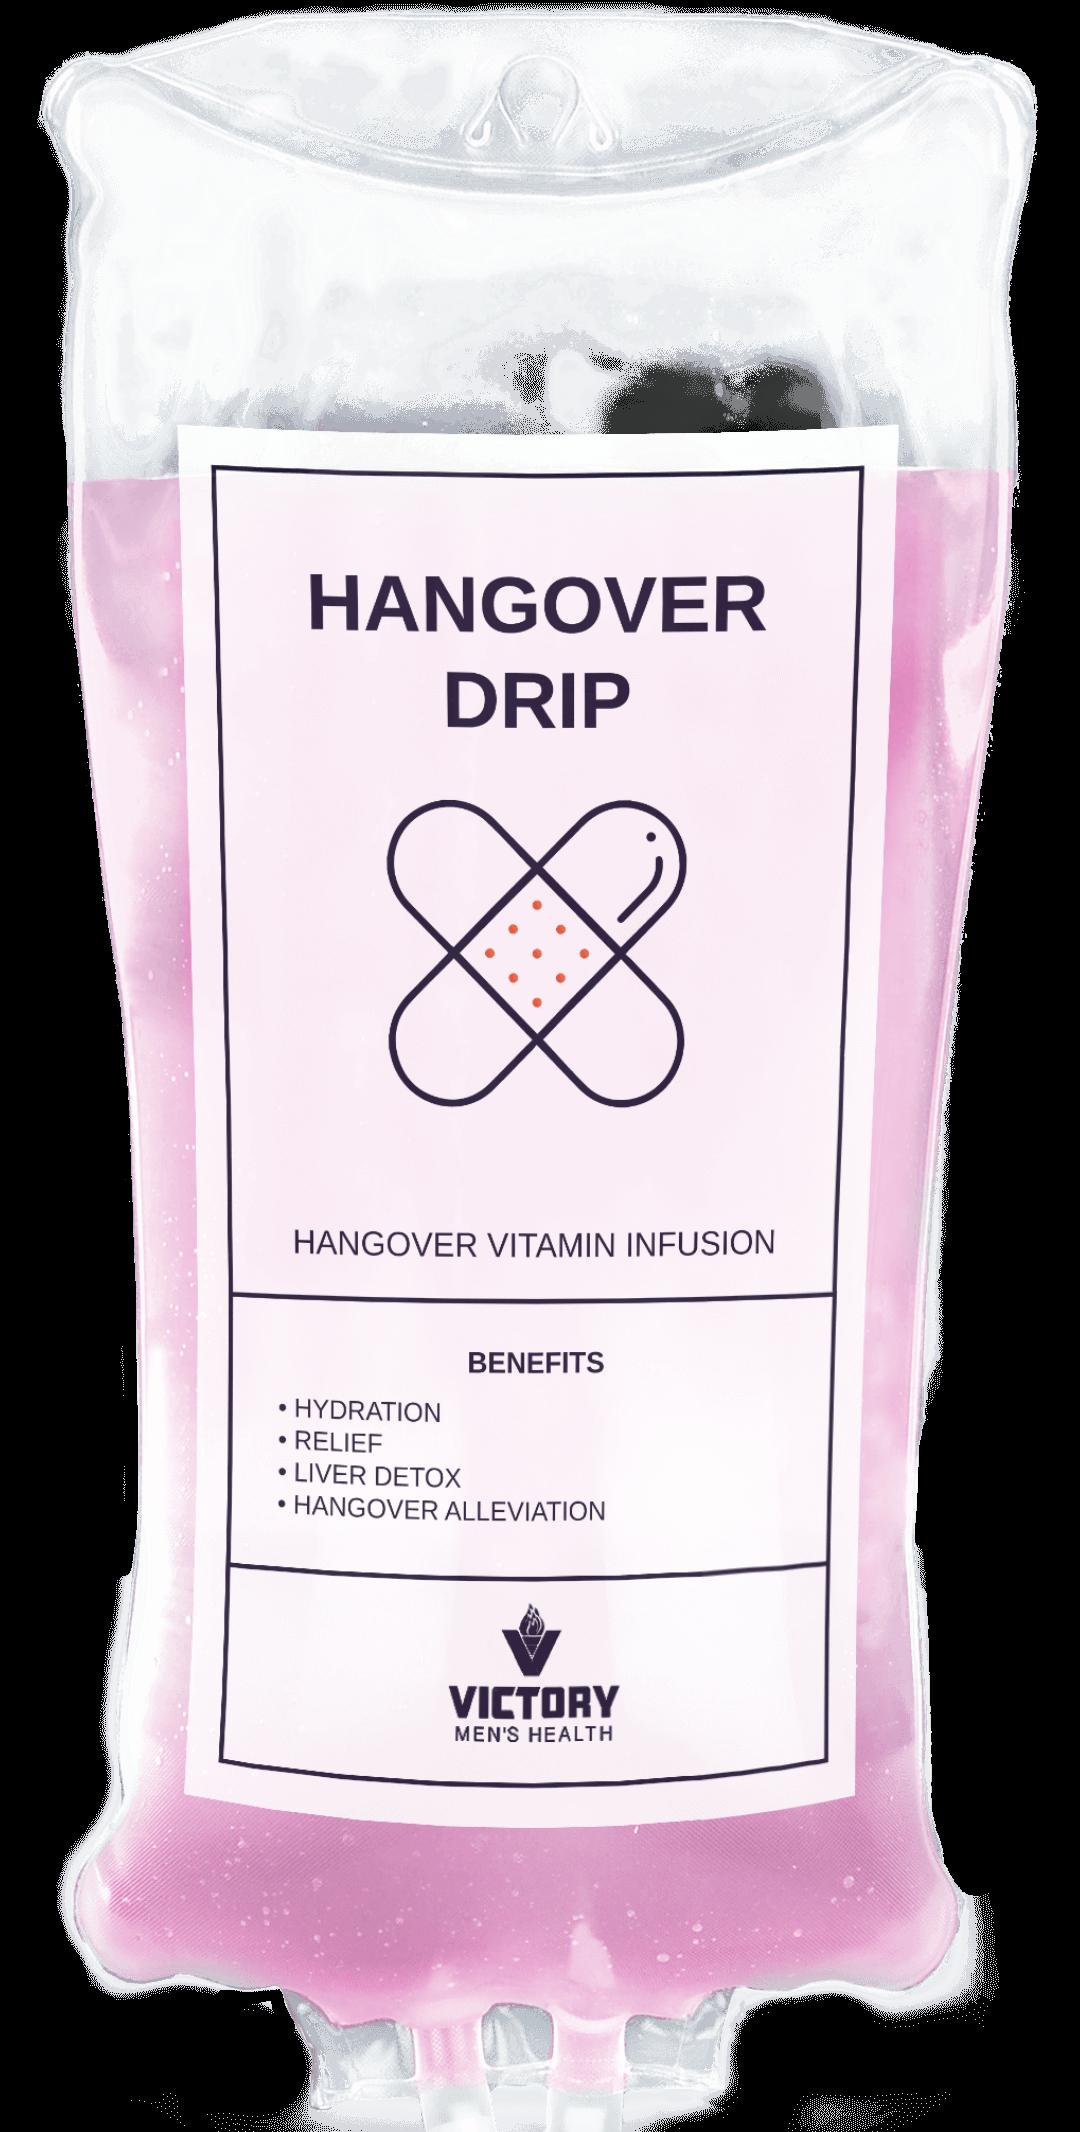 Hangover IV Drip | Victory Men's Health